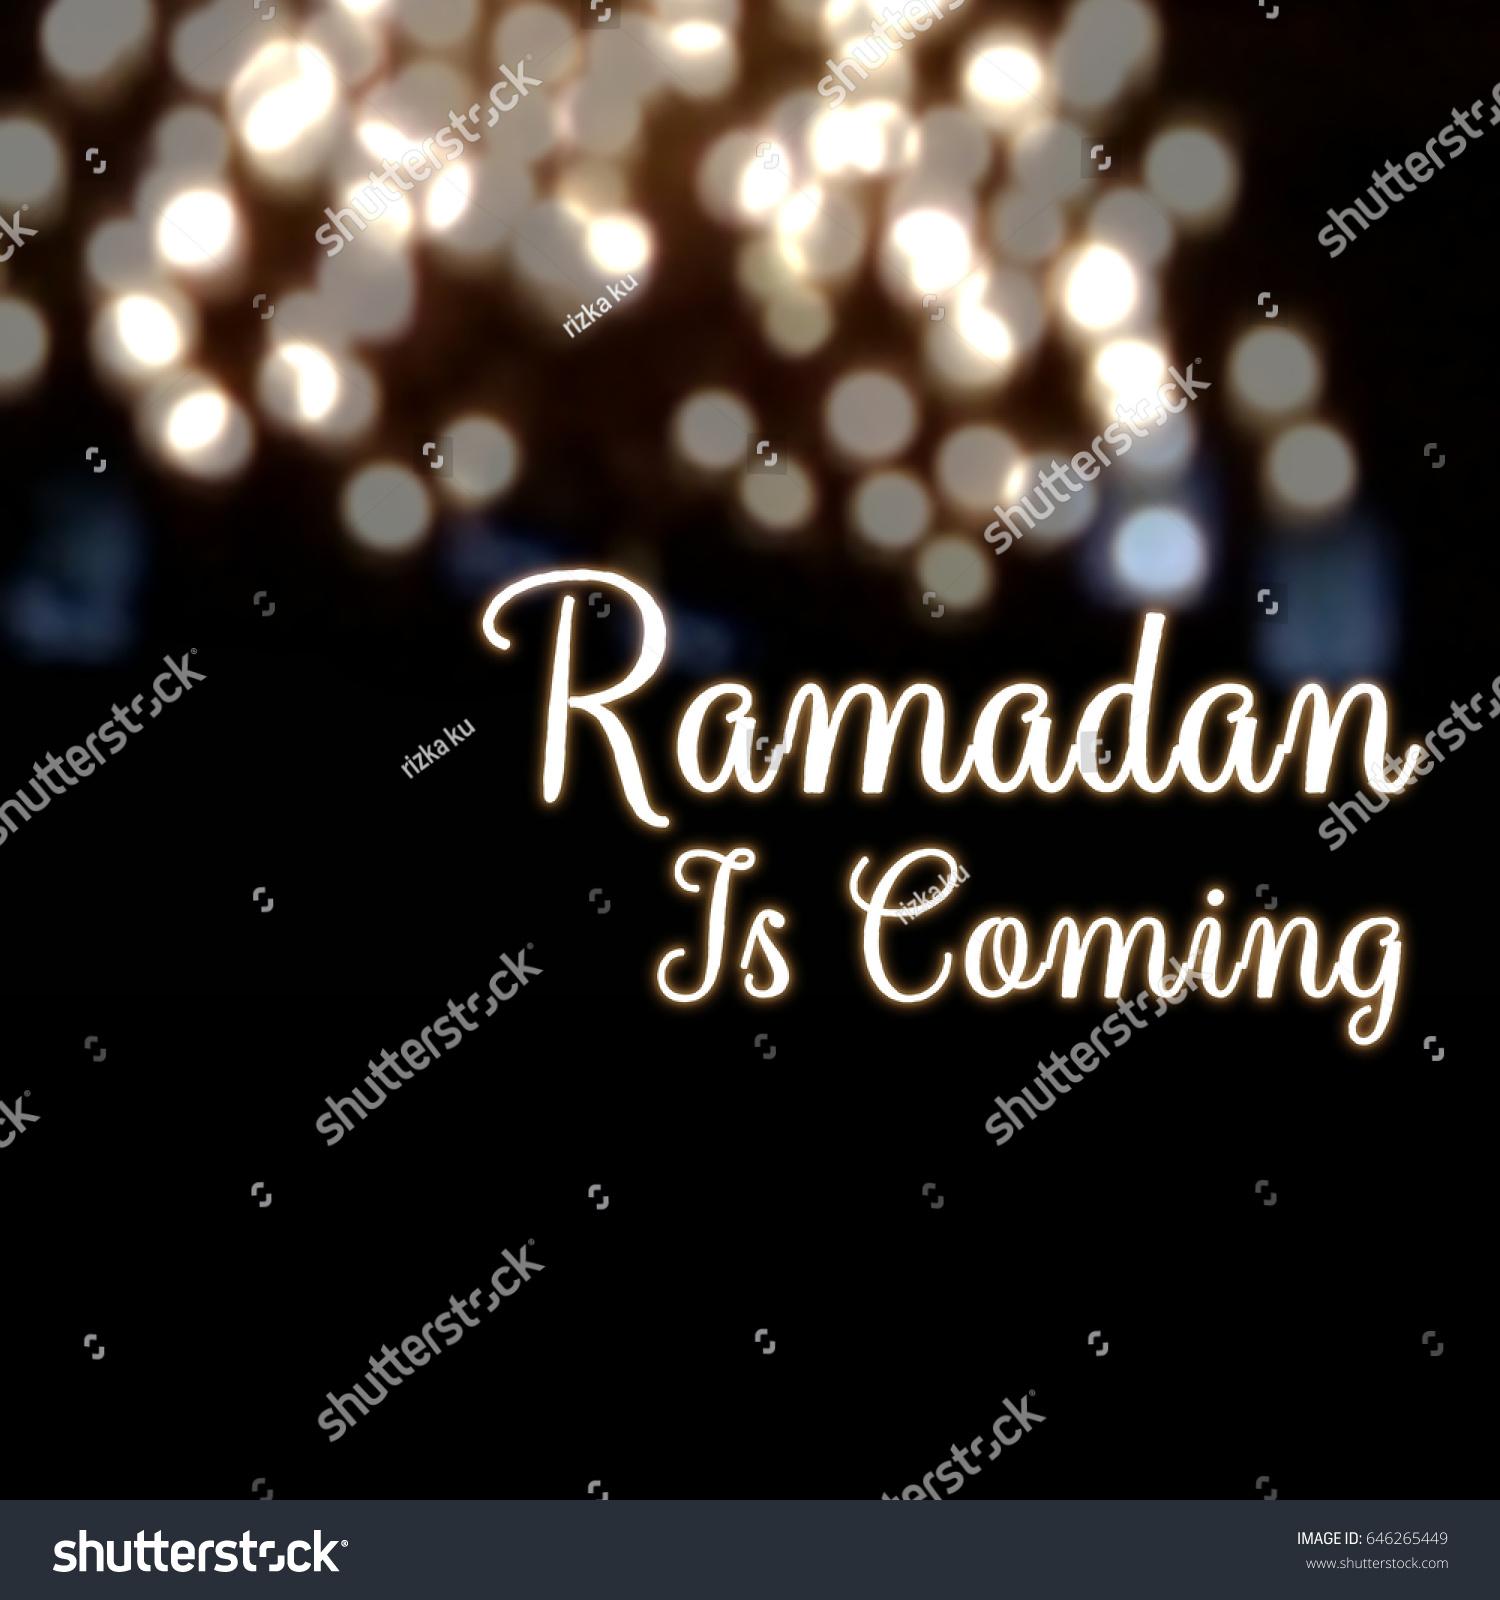 Ramadan month greetings ramadan coming islam fasting month greetings stock illustration m4hsunfo